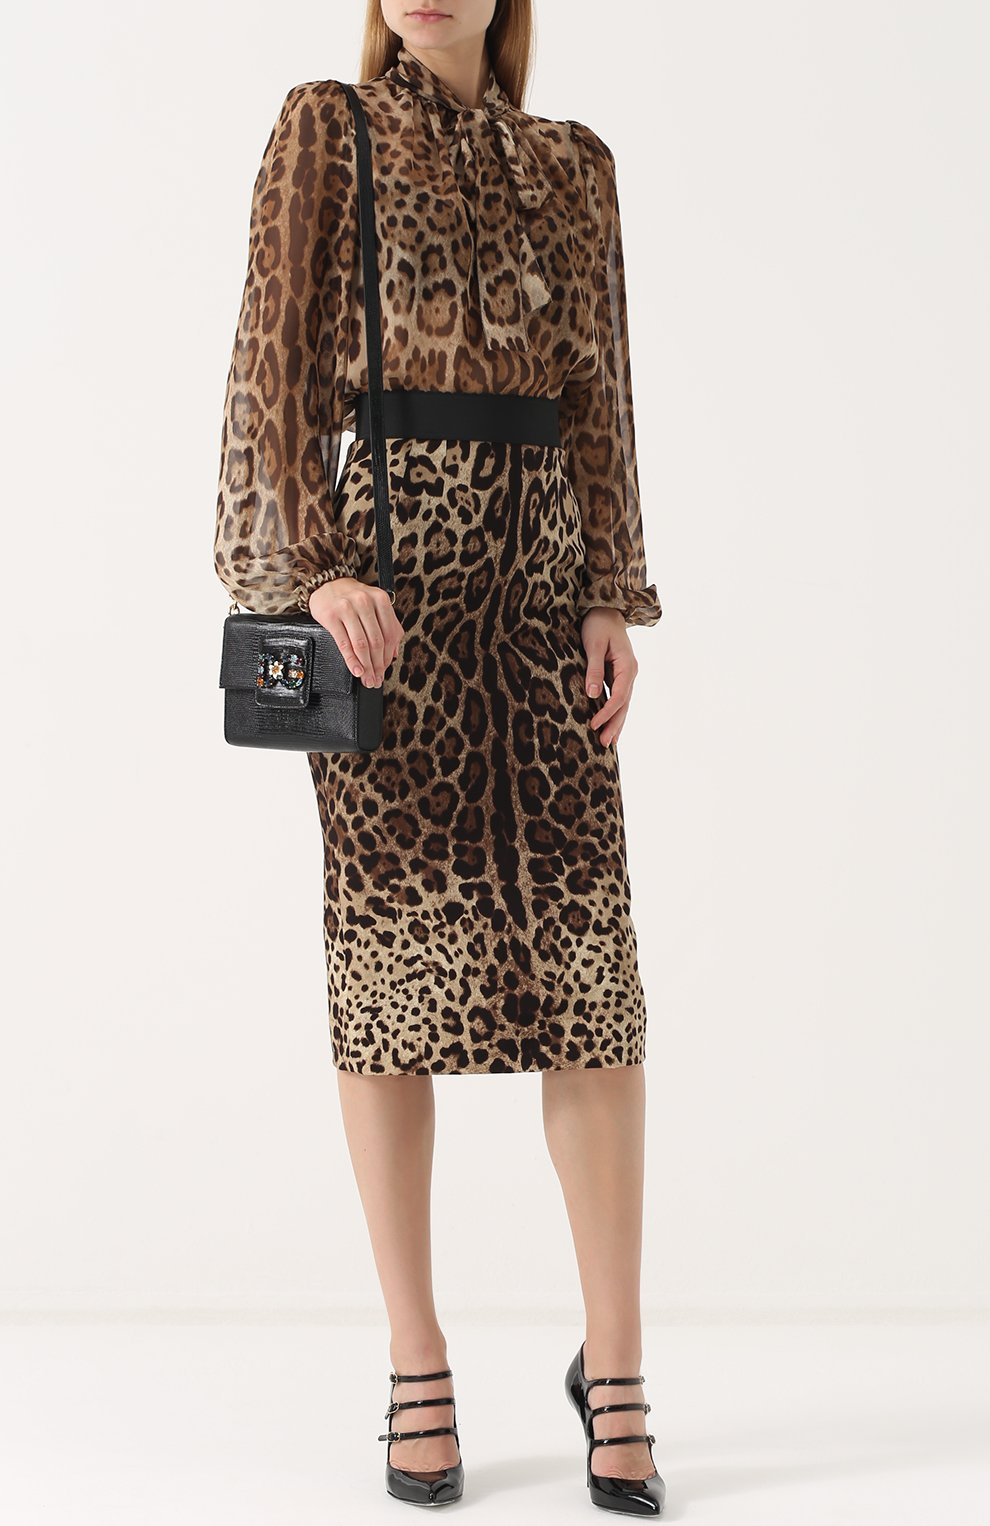 Сумка DG Millennials Dolce & Gabbana черная цвета | Фото №2